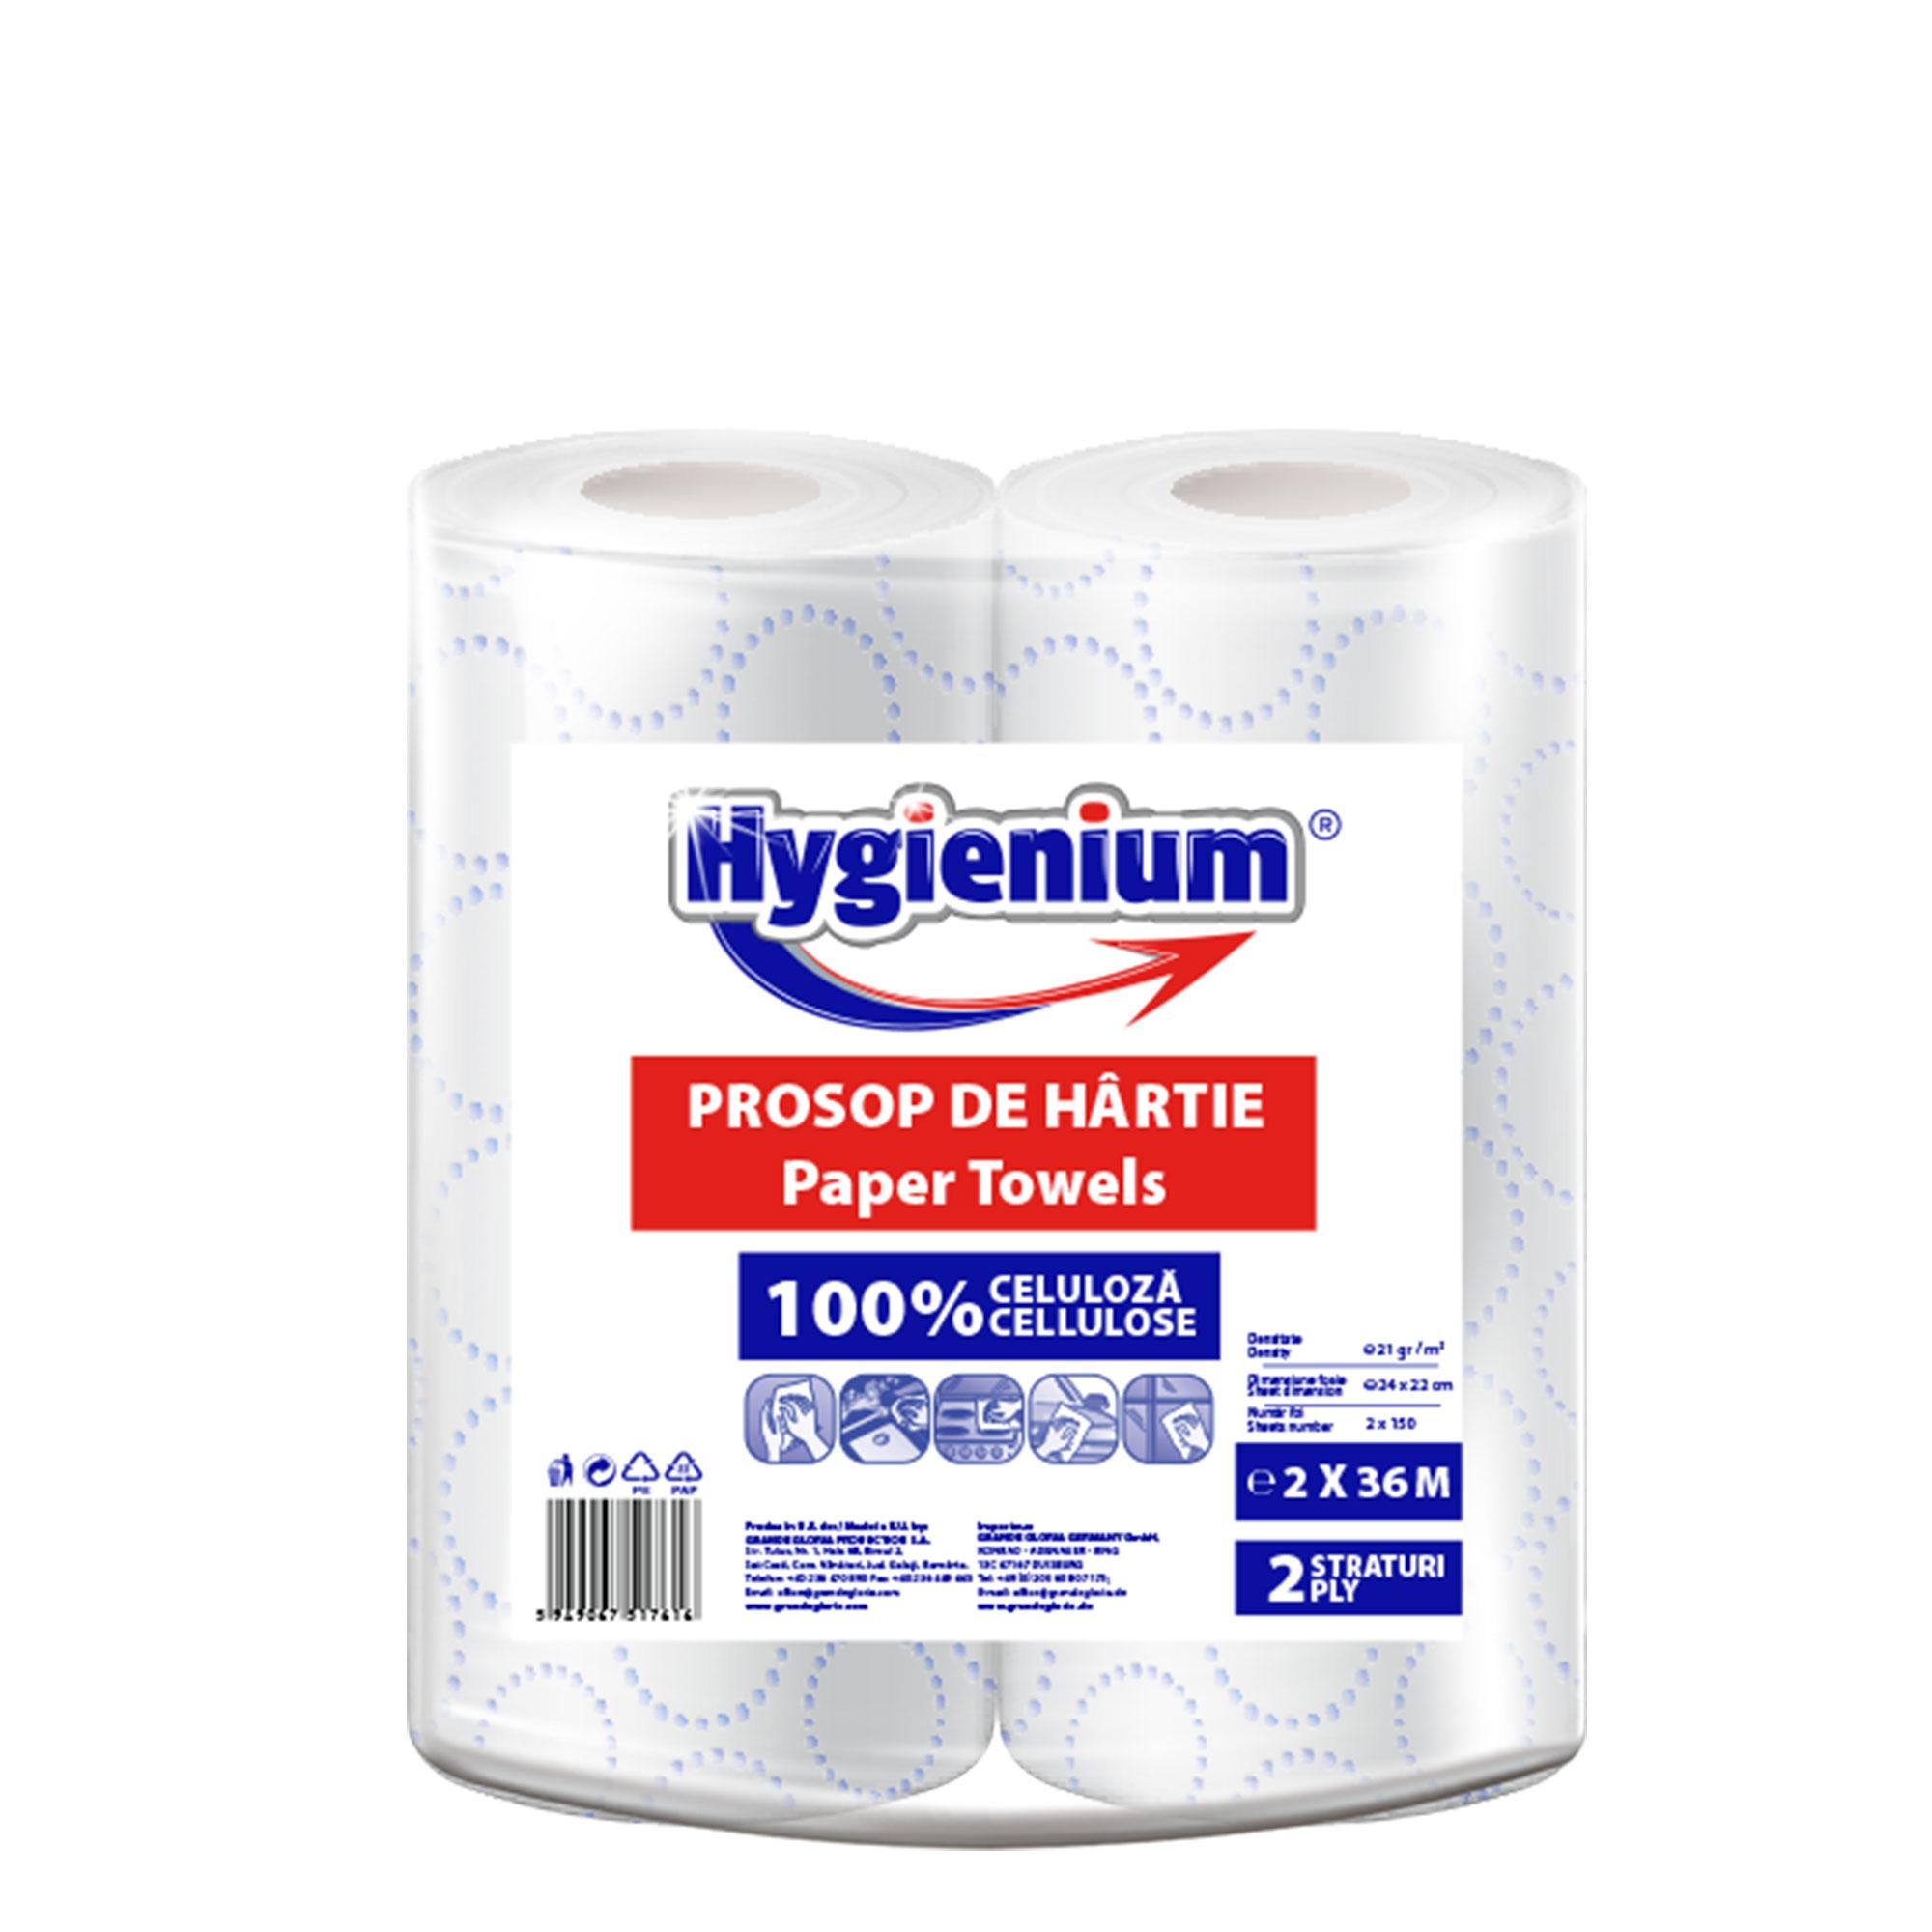 Hygienium Paper Towel 2x36 m